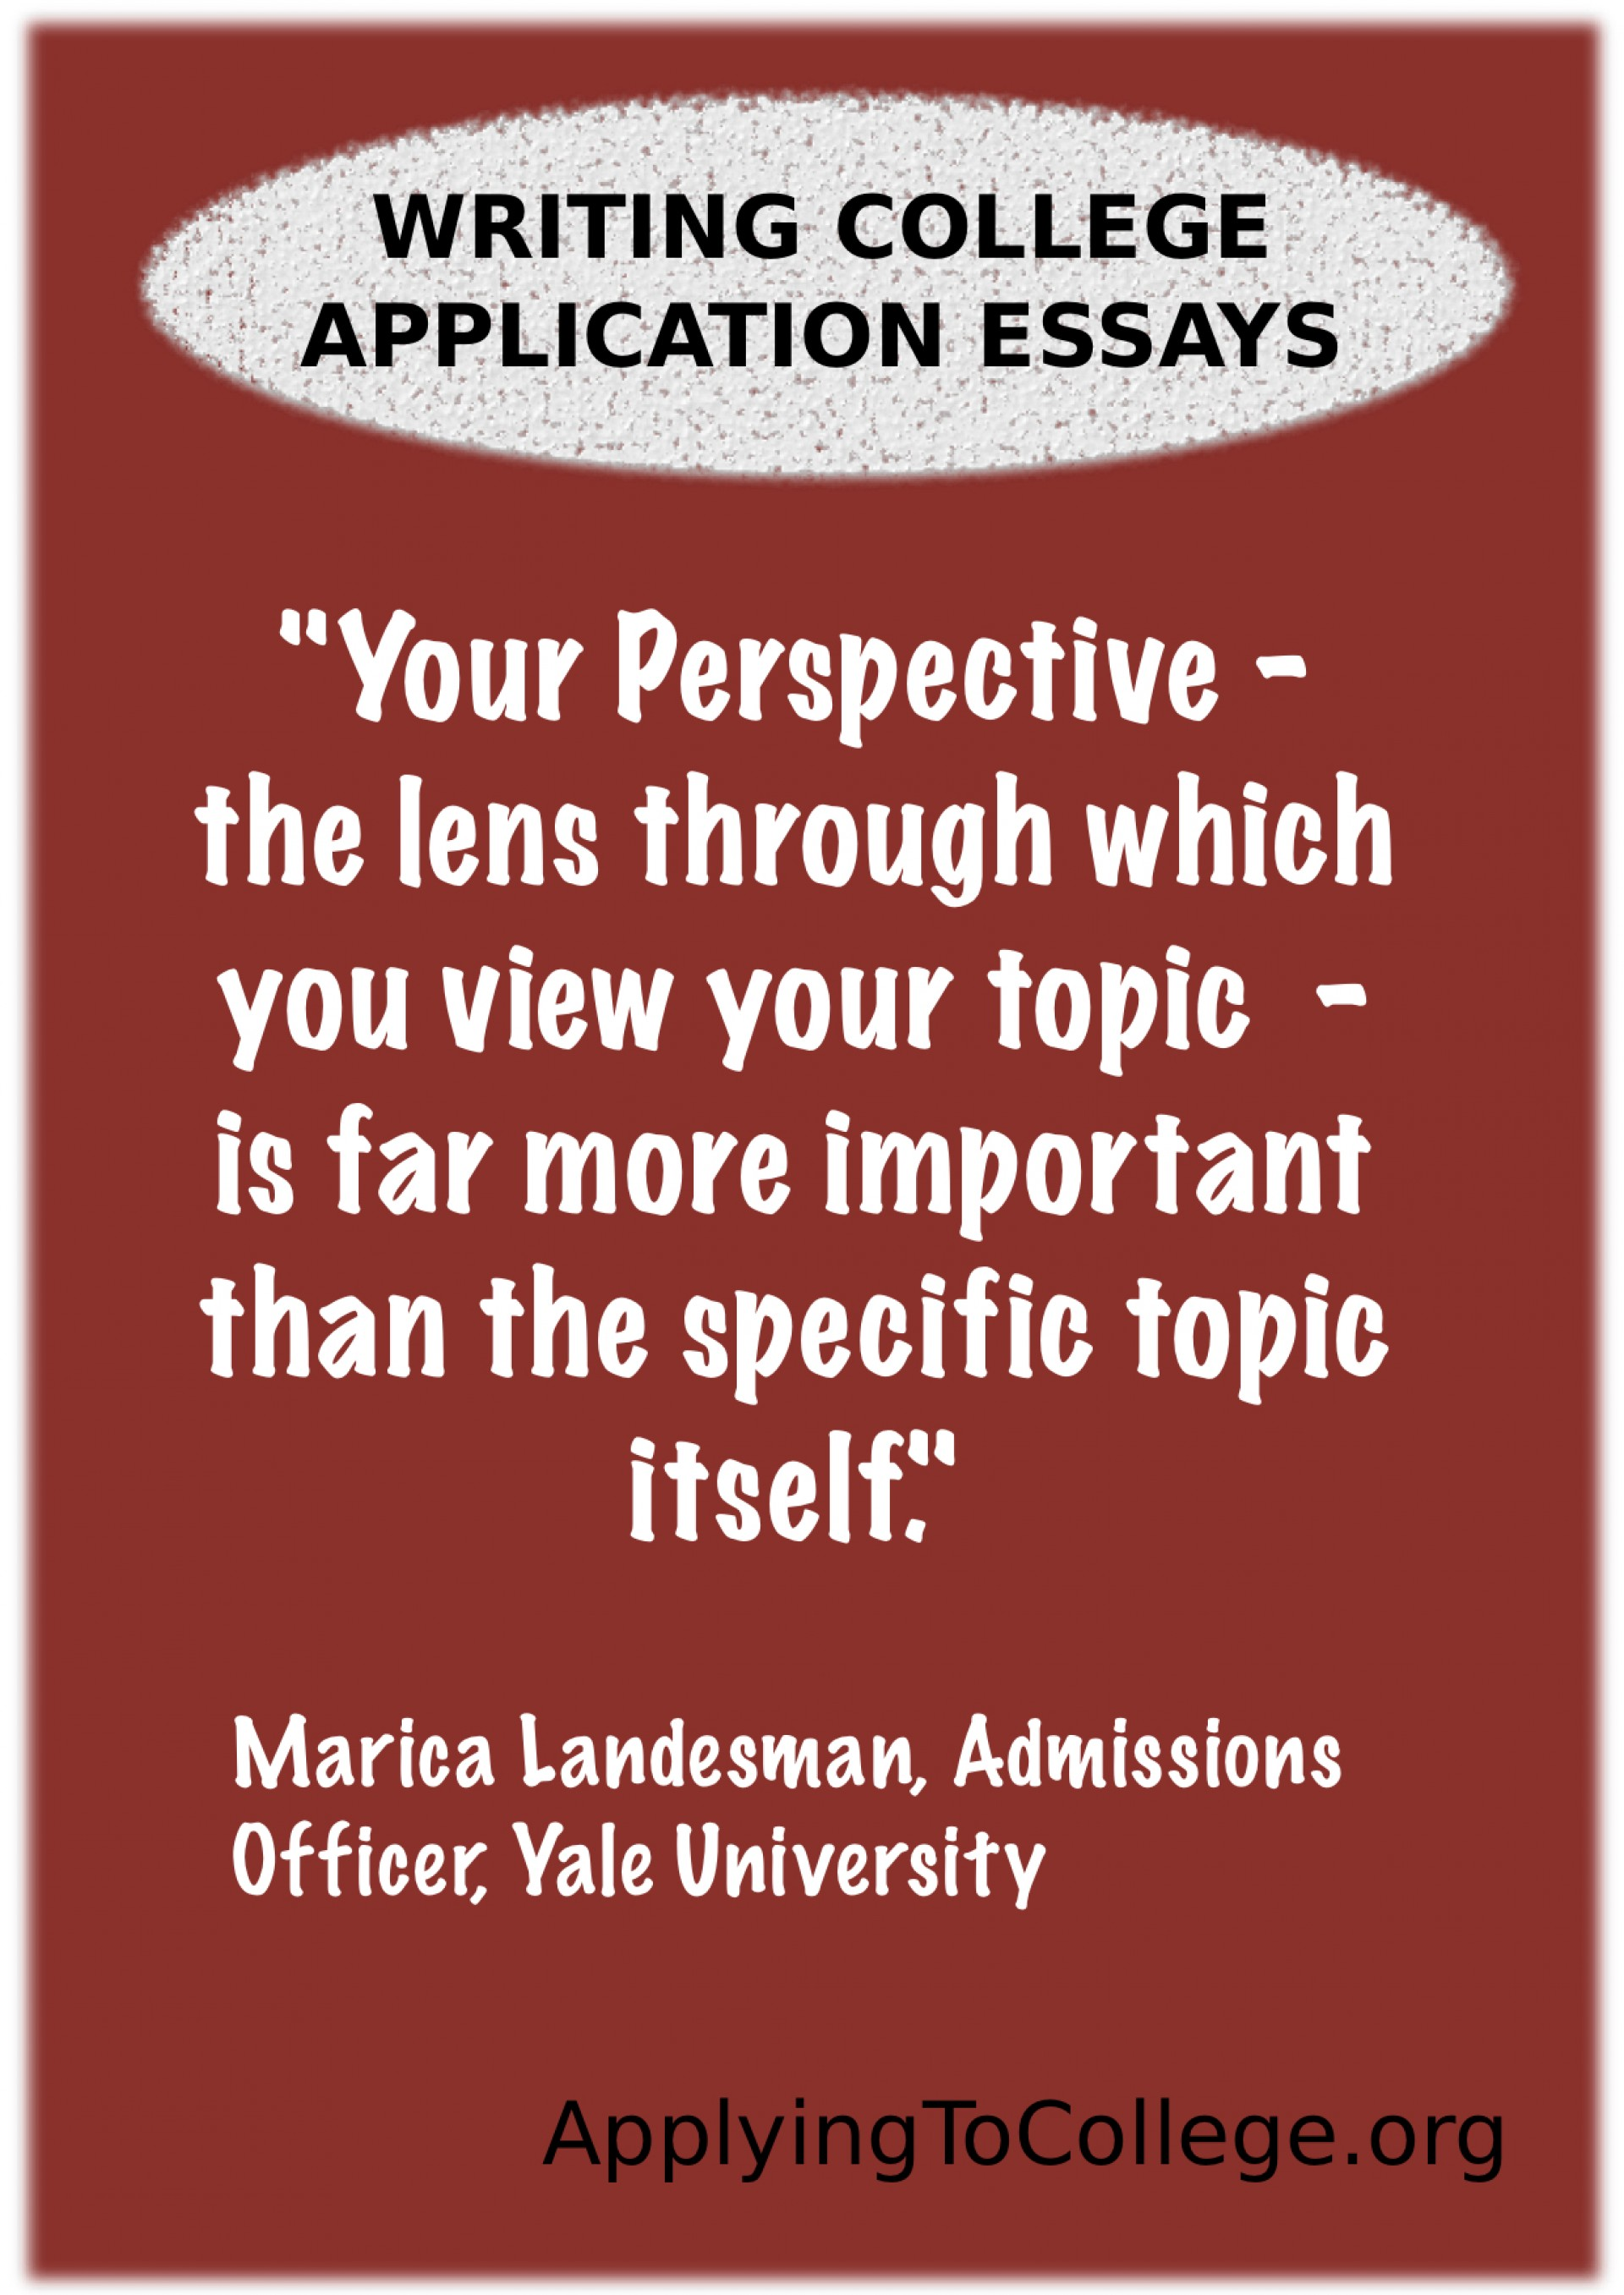 010 Yale Essay Writing Advice Help123 Beautiful 1920